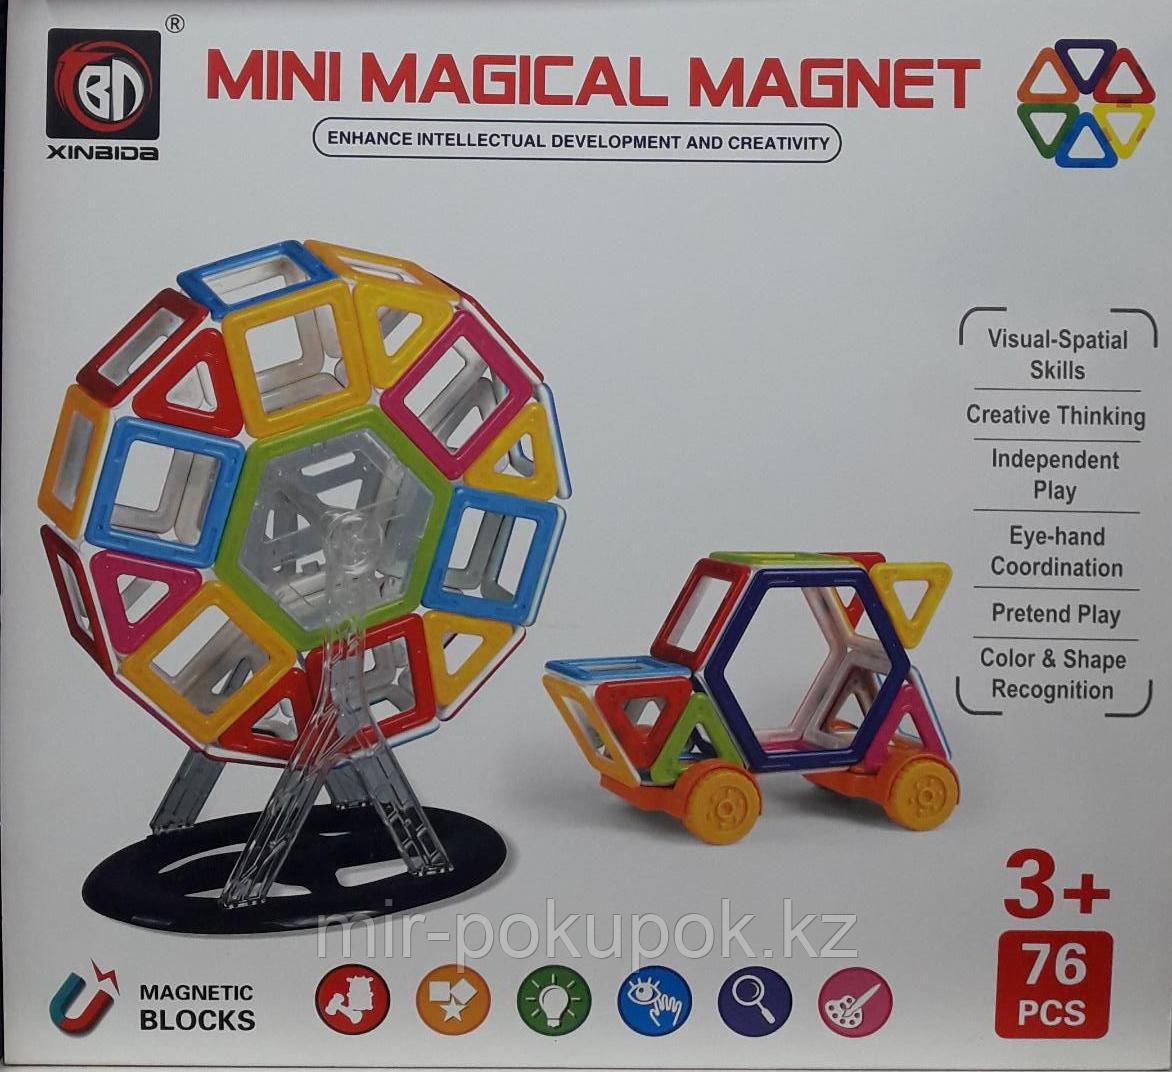 Magical Magnet: Магнитный конструктор, 76 дет., Алматы